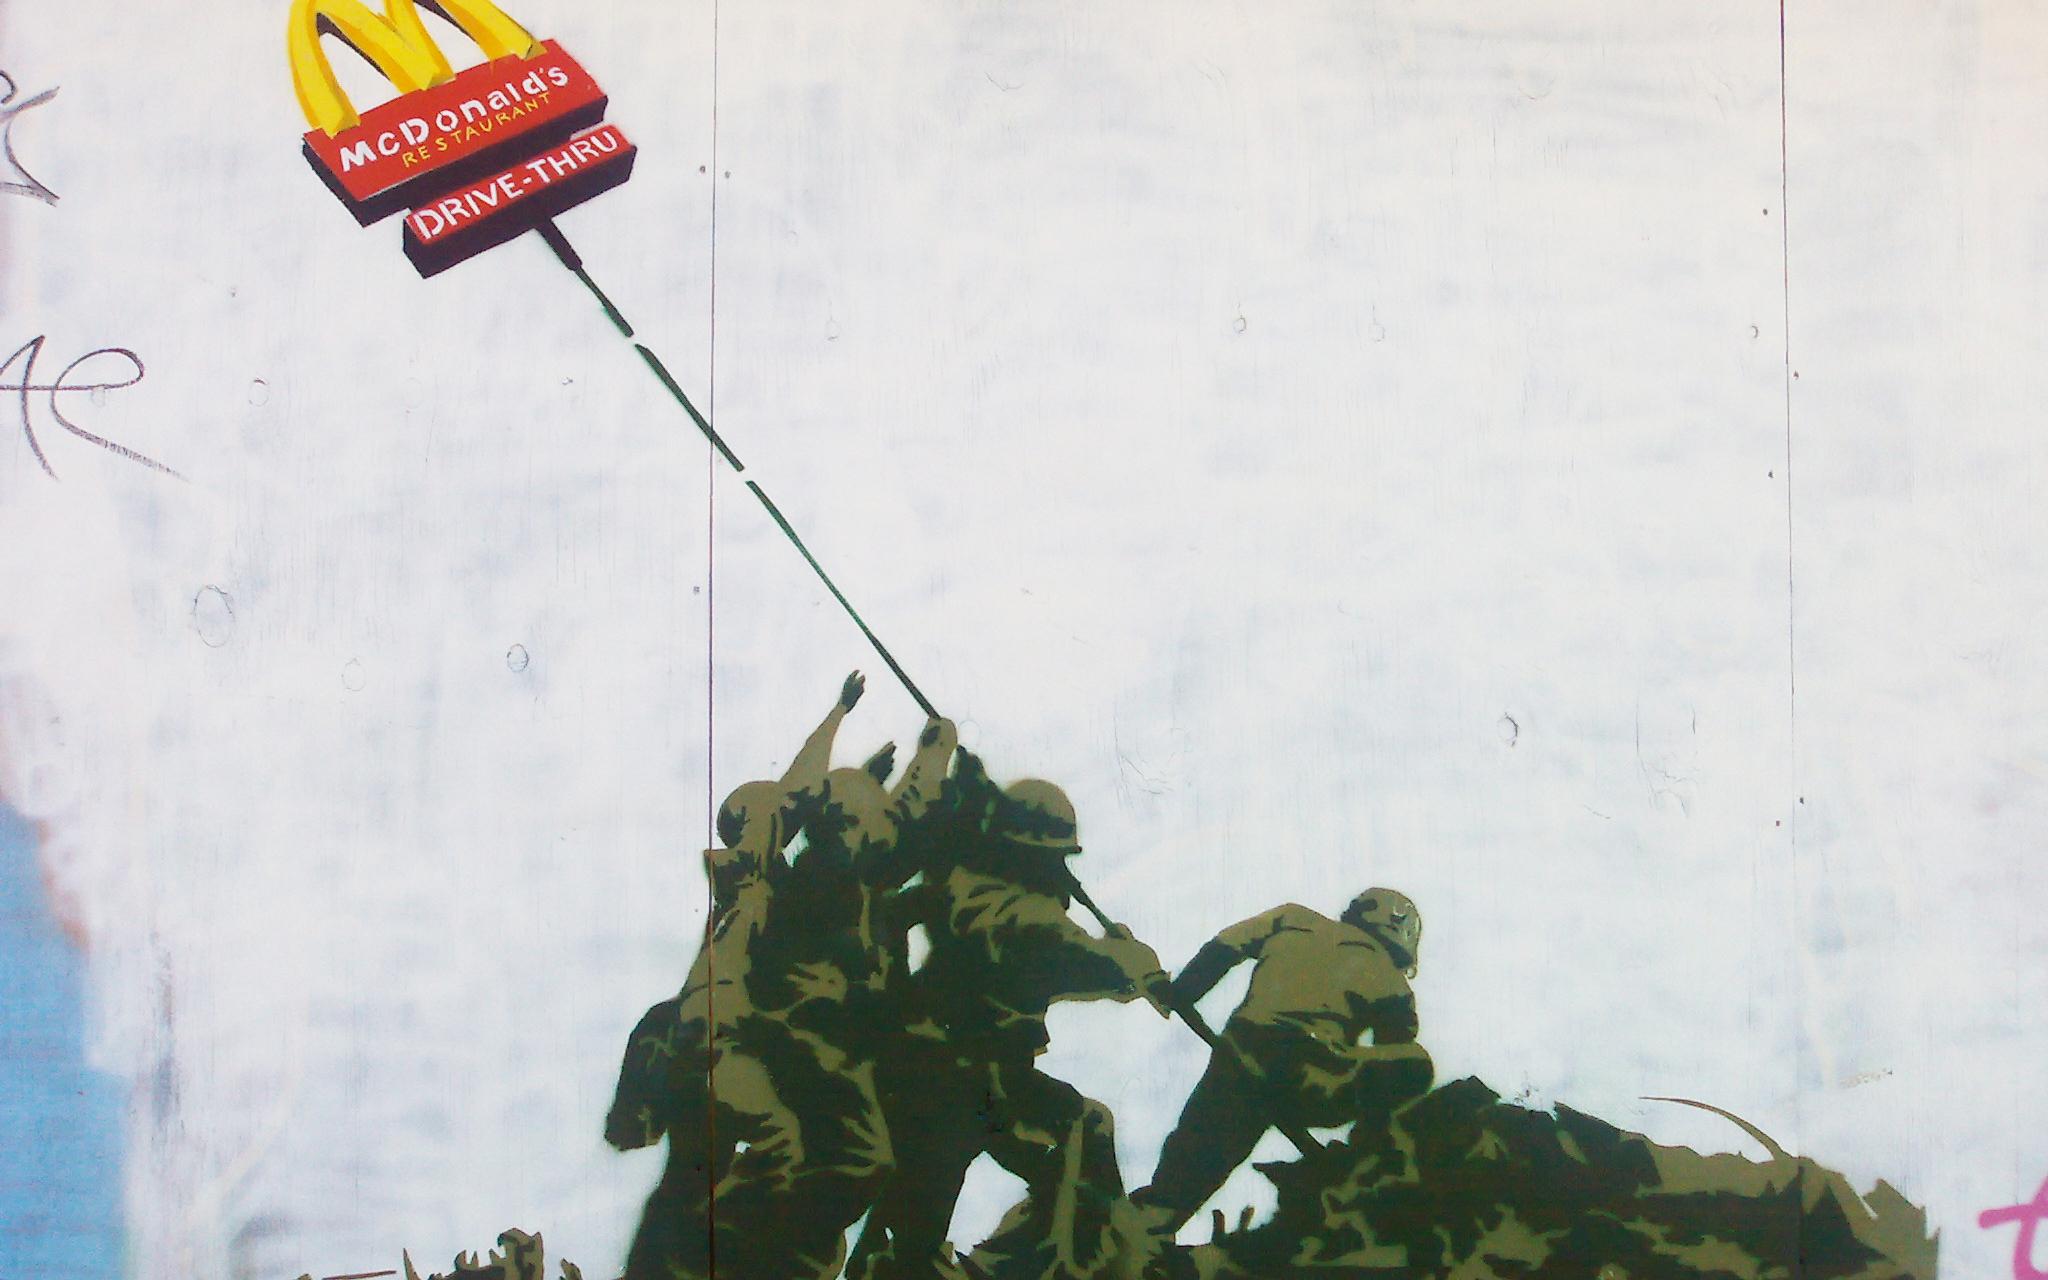 Iwo Jima Flag Raising Wallpapers amxxcs Iwo Jima Wallpaper More information 2048x1280